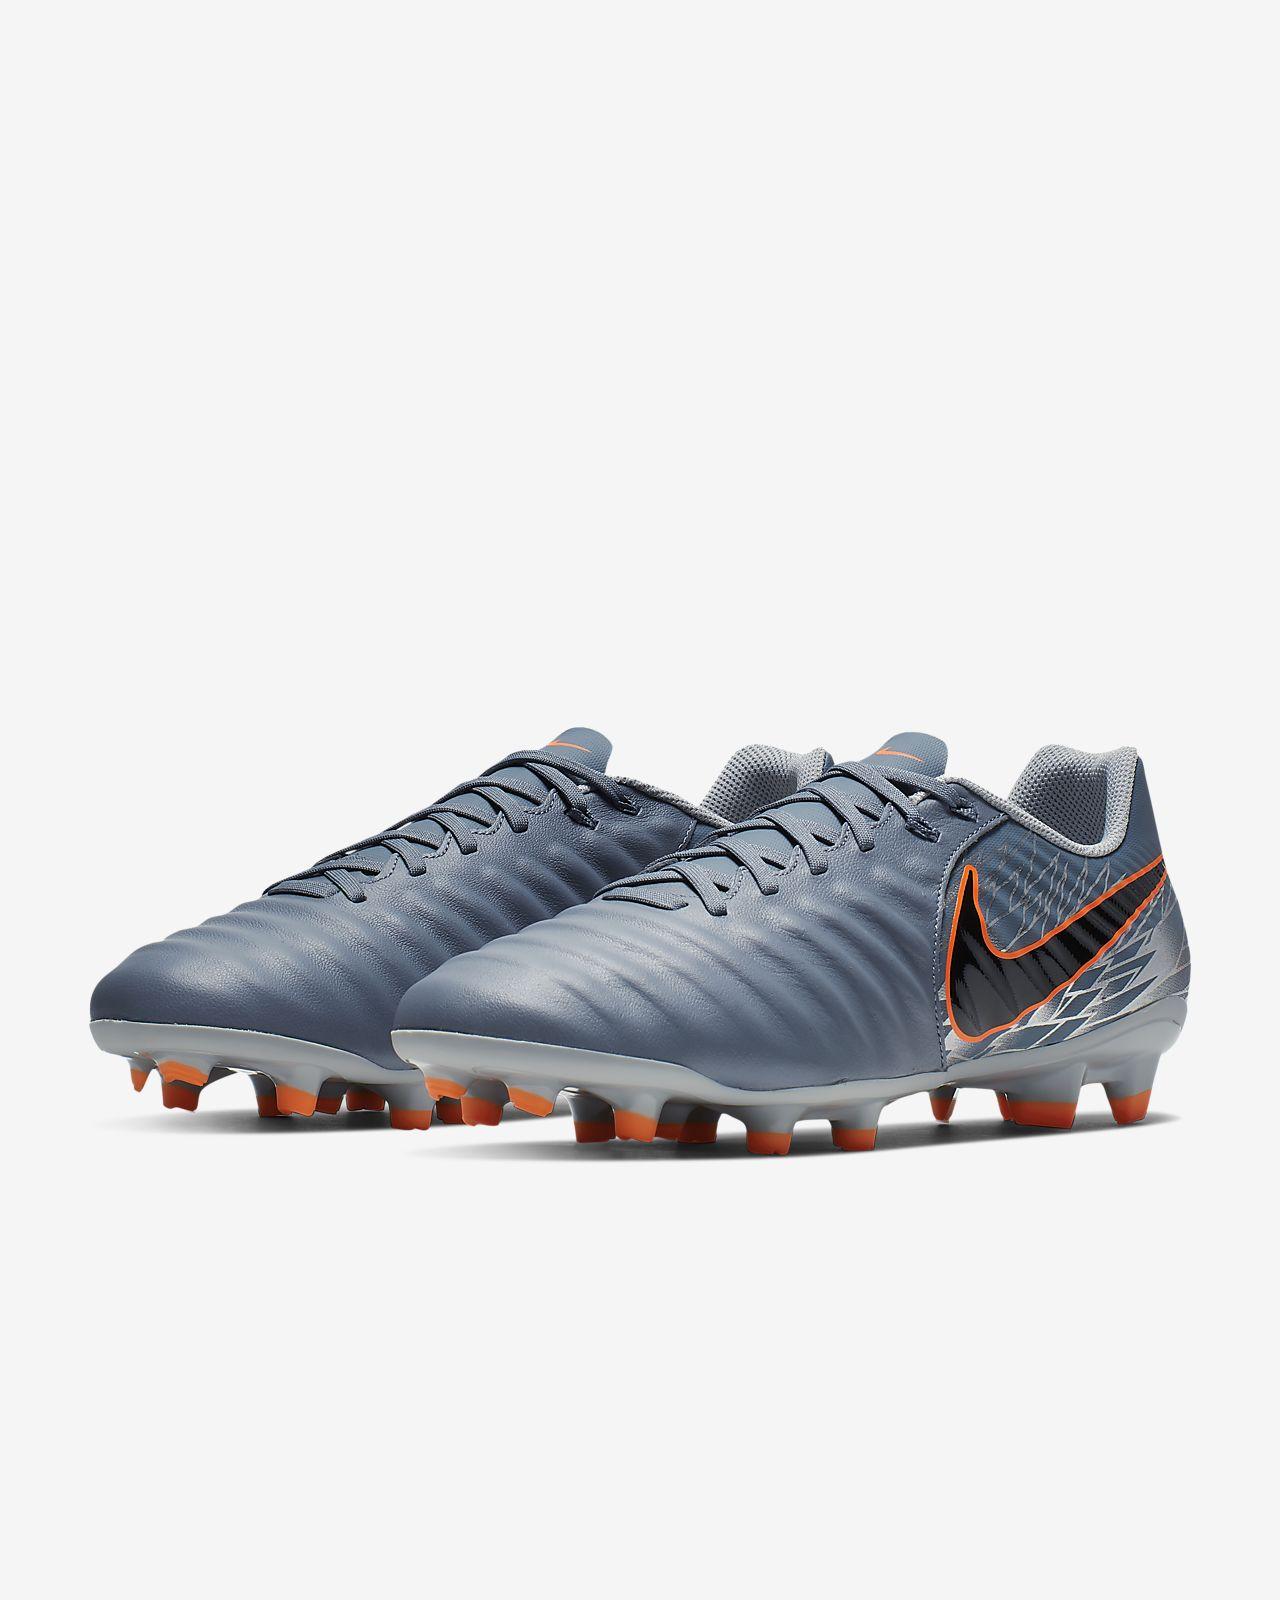 hot sale online cac0c 250e3 ... Nike Tiempo Legend VII Academy Botas de fútbol para terreno firme